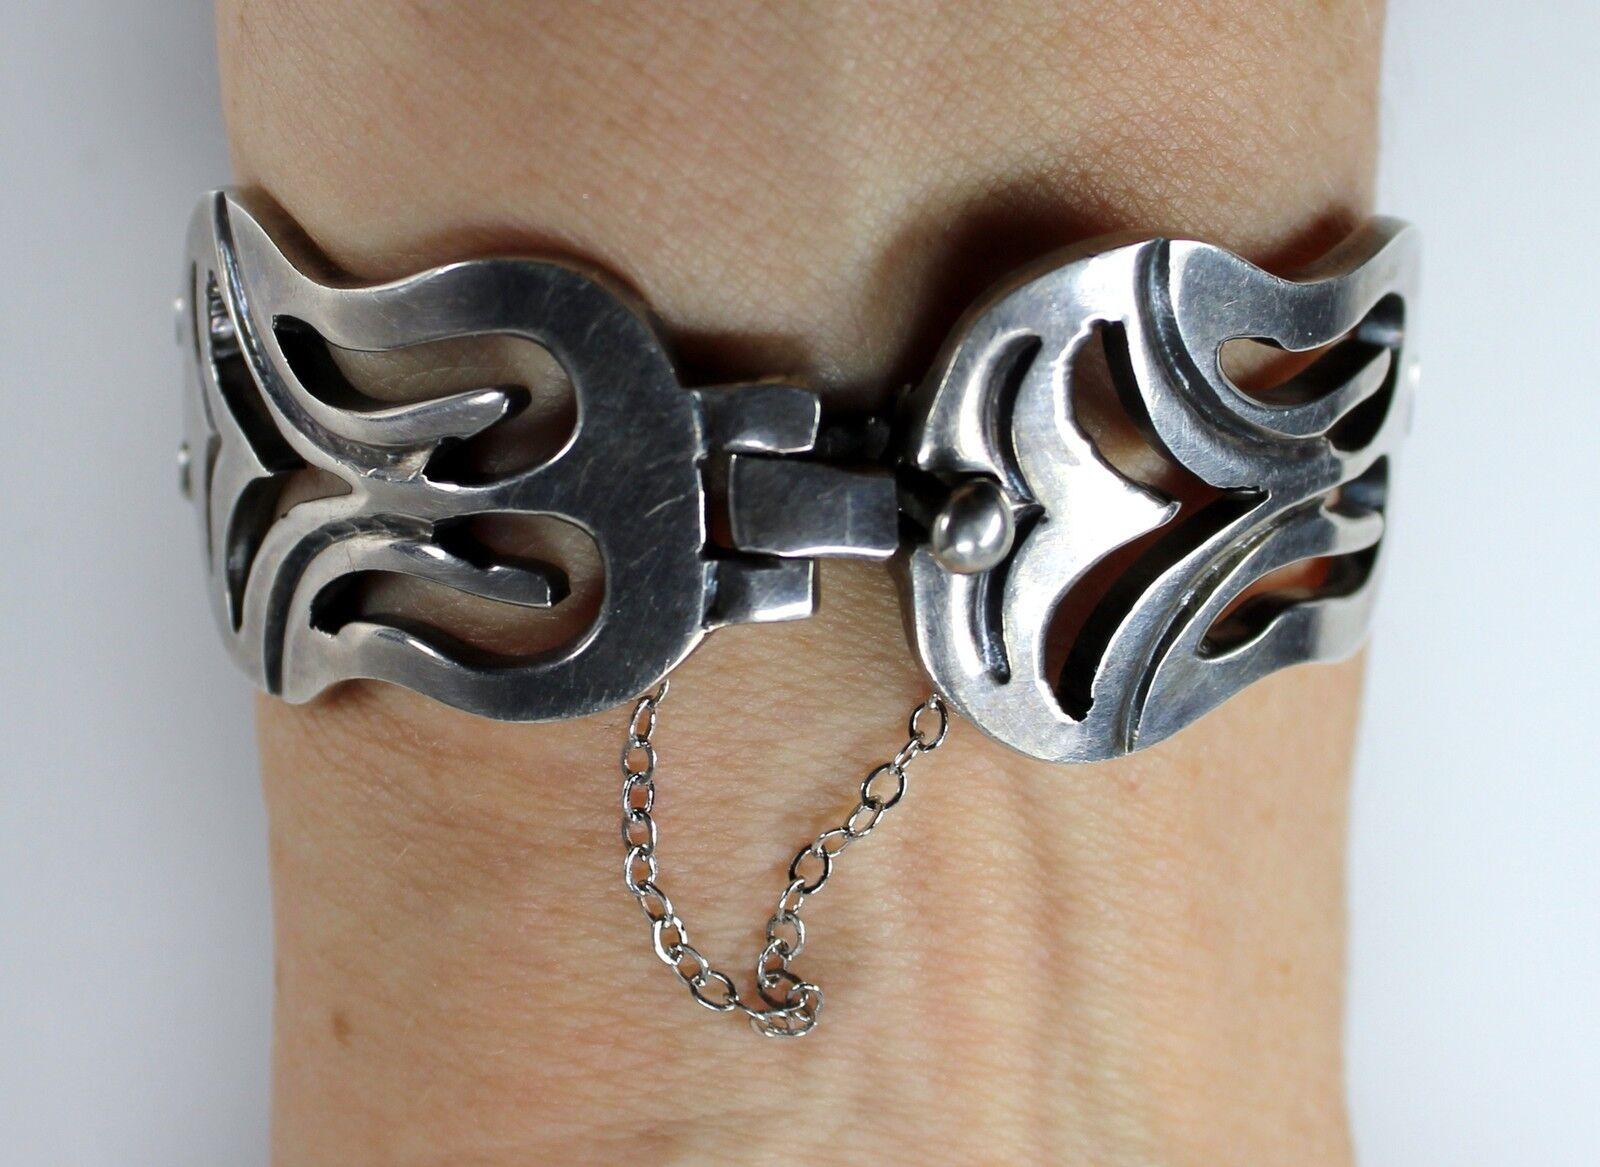 BETO SIMPLE ELEGANCE vintage Mexican sterling silver connecting leaves bracelet